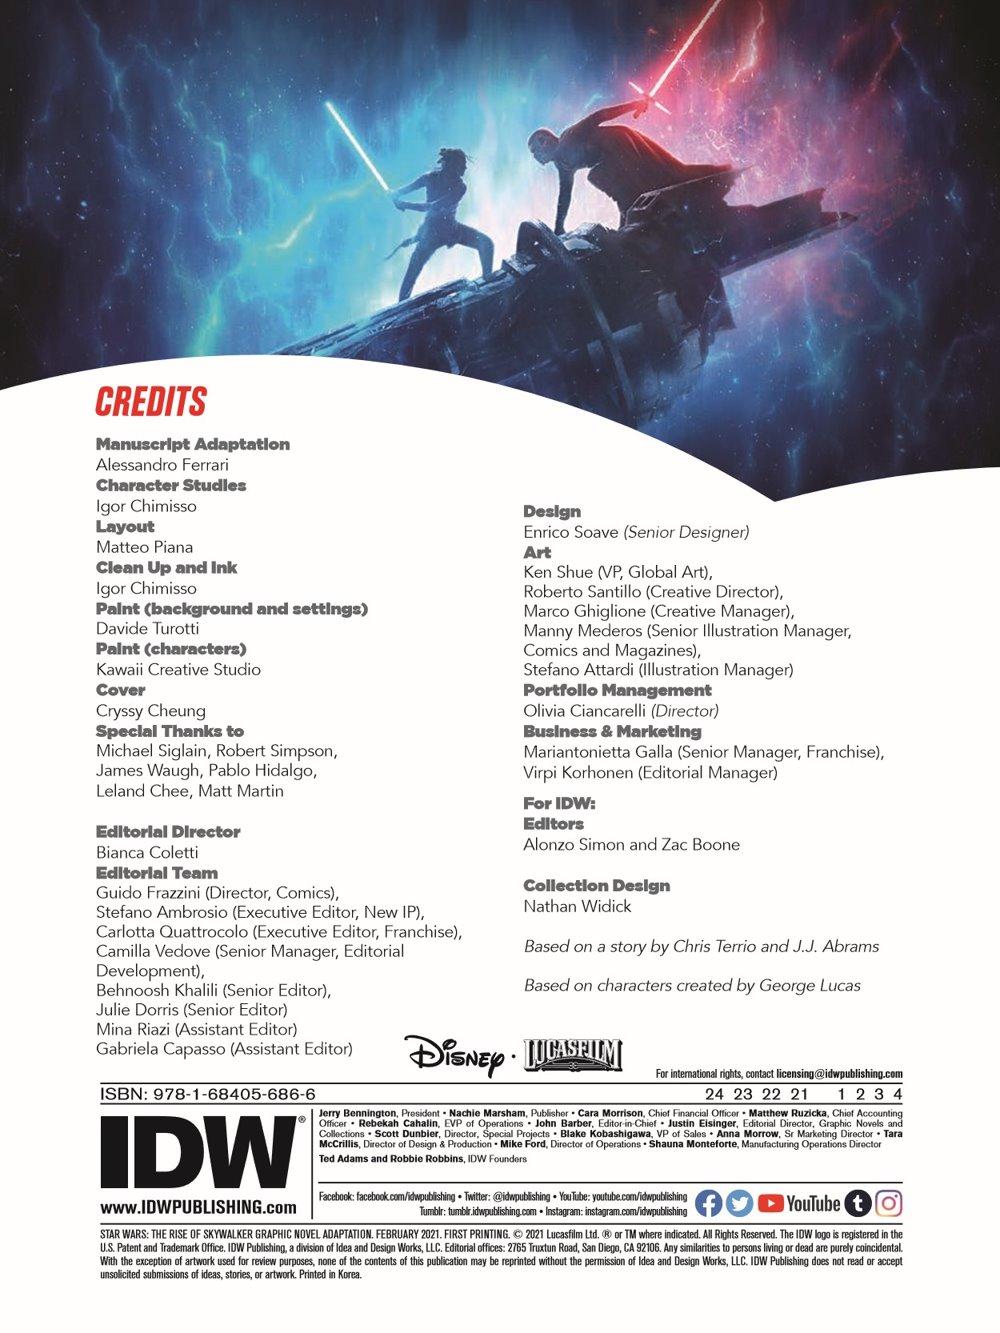 StarWars_IX_TheRiseOfSkywalker_pr-2 ComicList Previews: STAR WARS THE RISE OF SKYWALKER GN